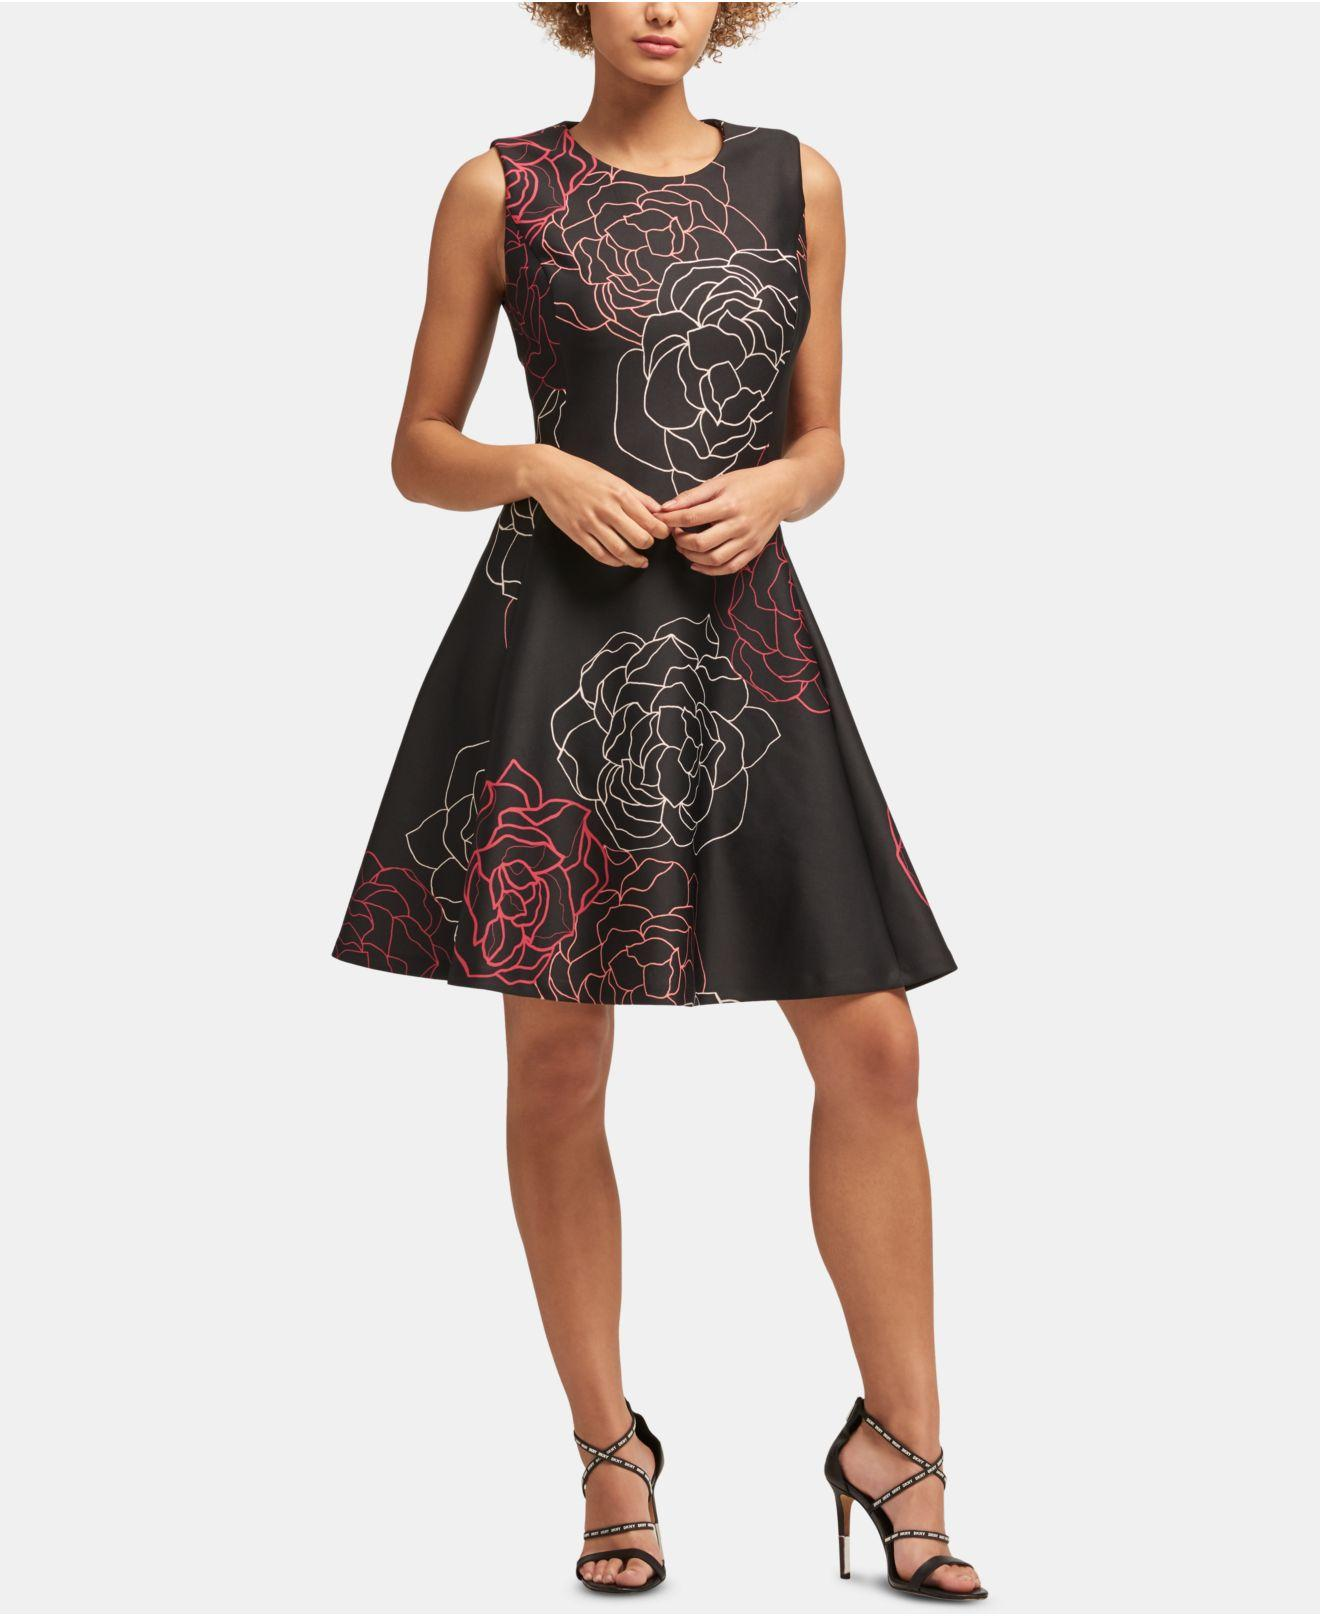 e6b6d68966f Lyst - DKNY Sleeveless Printed Fit   Flare Dress in Black